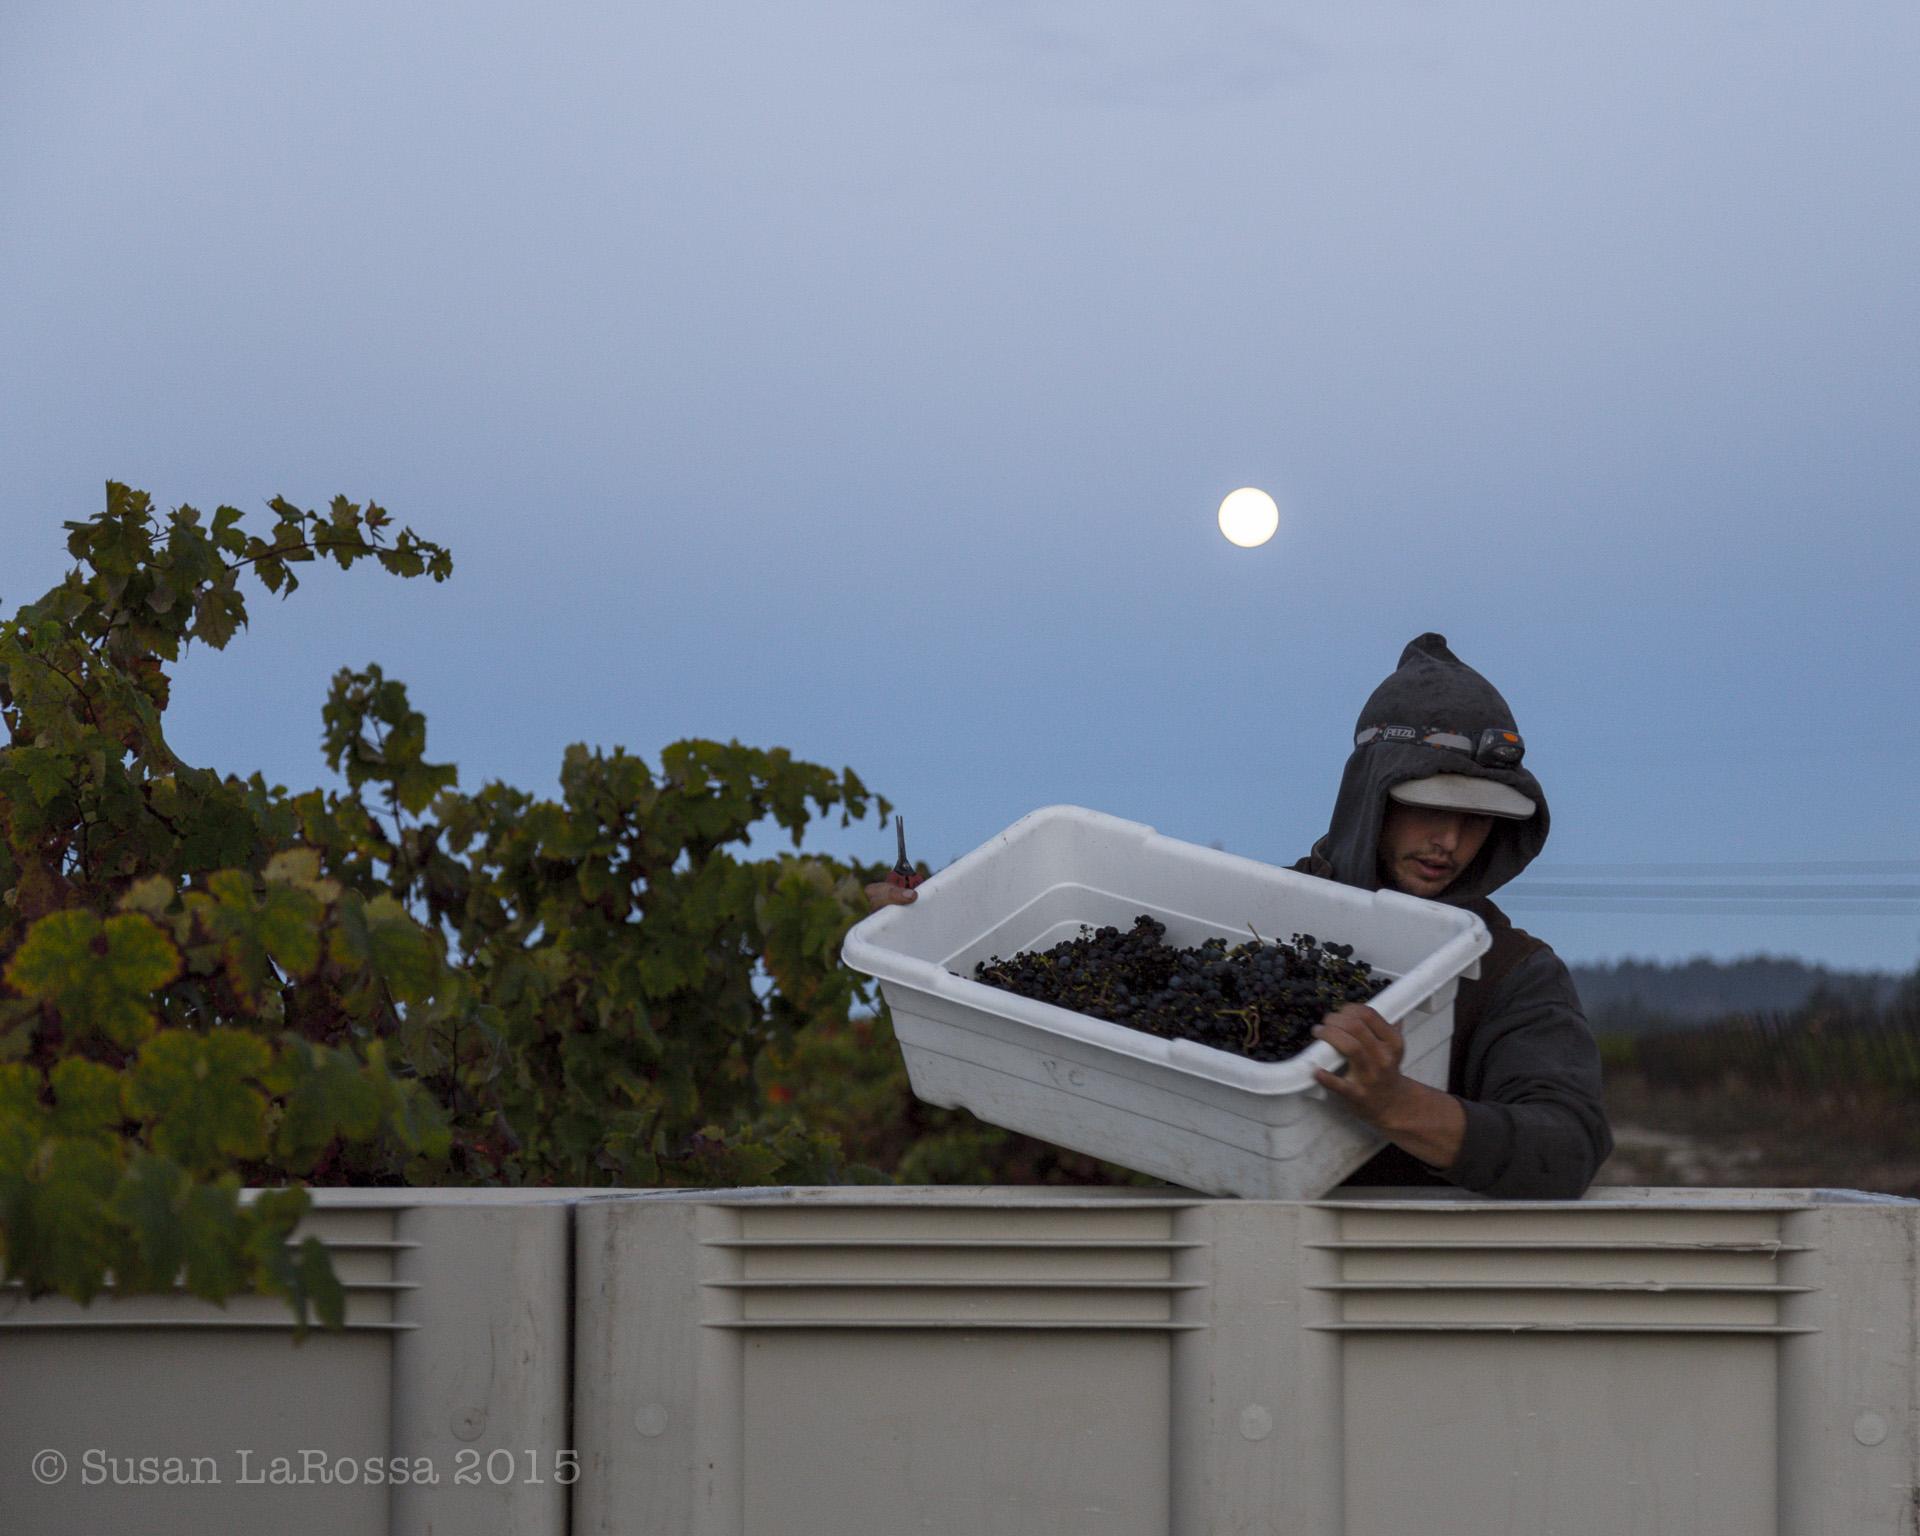 Evan dumping grapes under a full moon